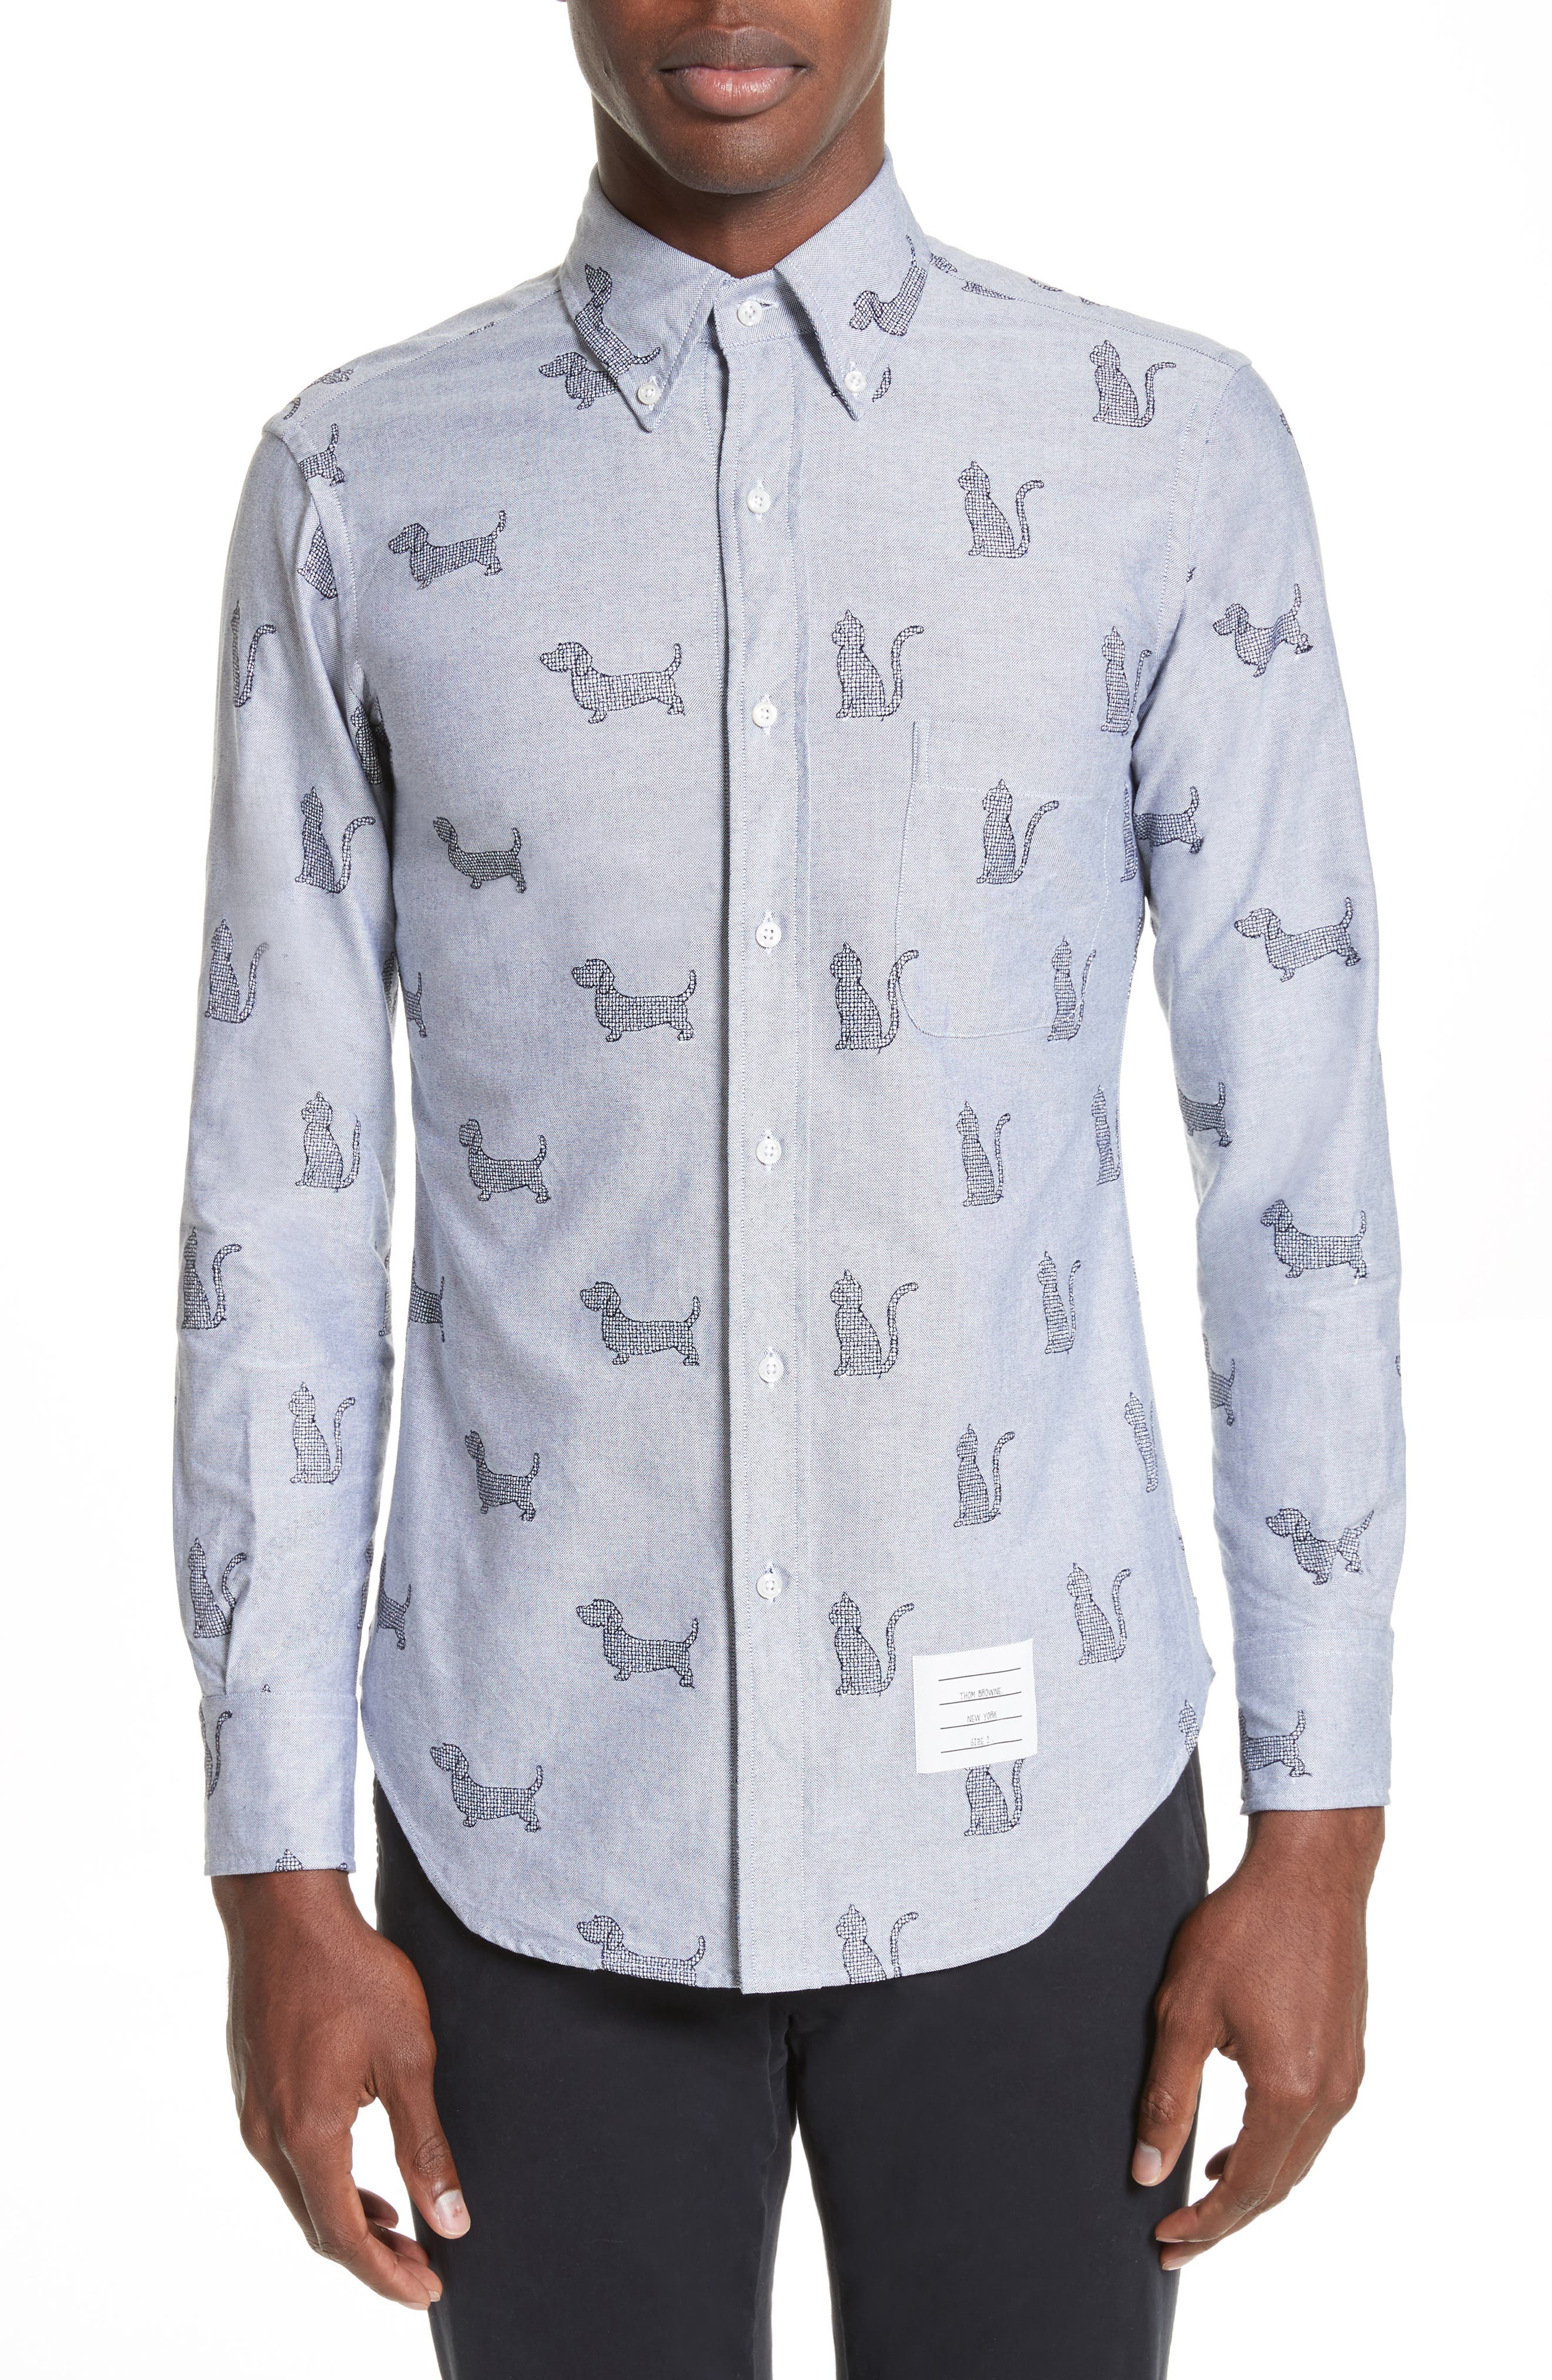 Daschund Kitty Print Shirt,                             Main thumbnail 1, color,                             415